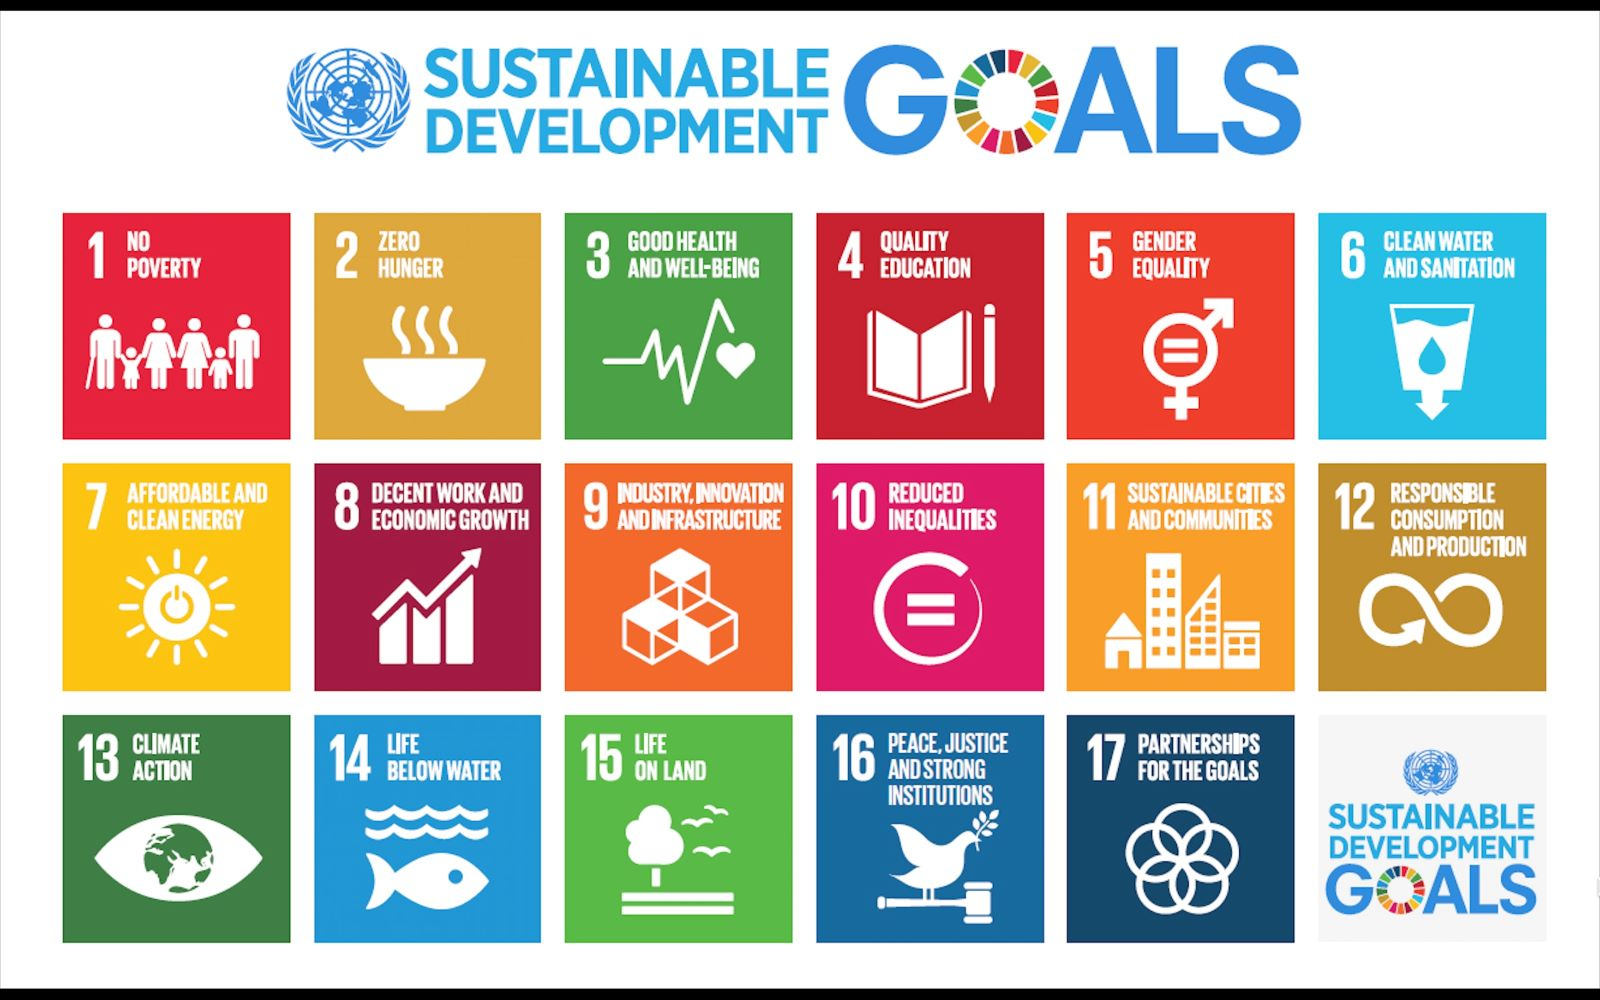 Thailand tops UN Sustainable Development Goals (SDGs) rank in ASEAN